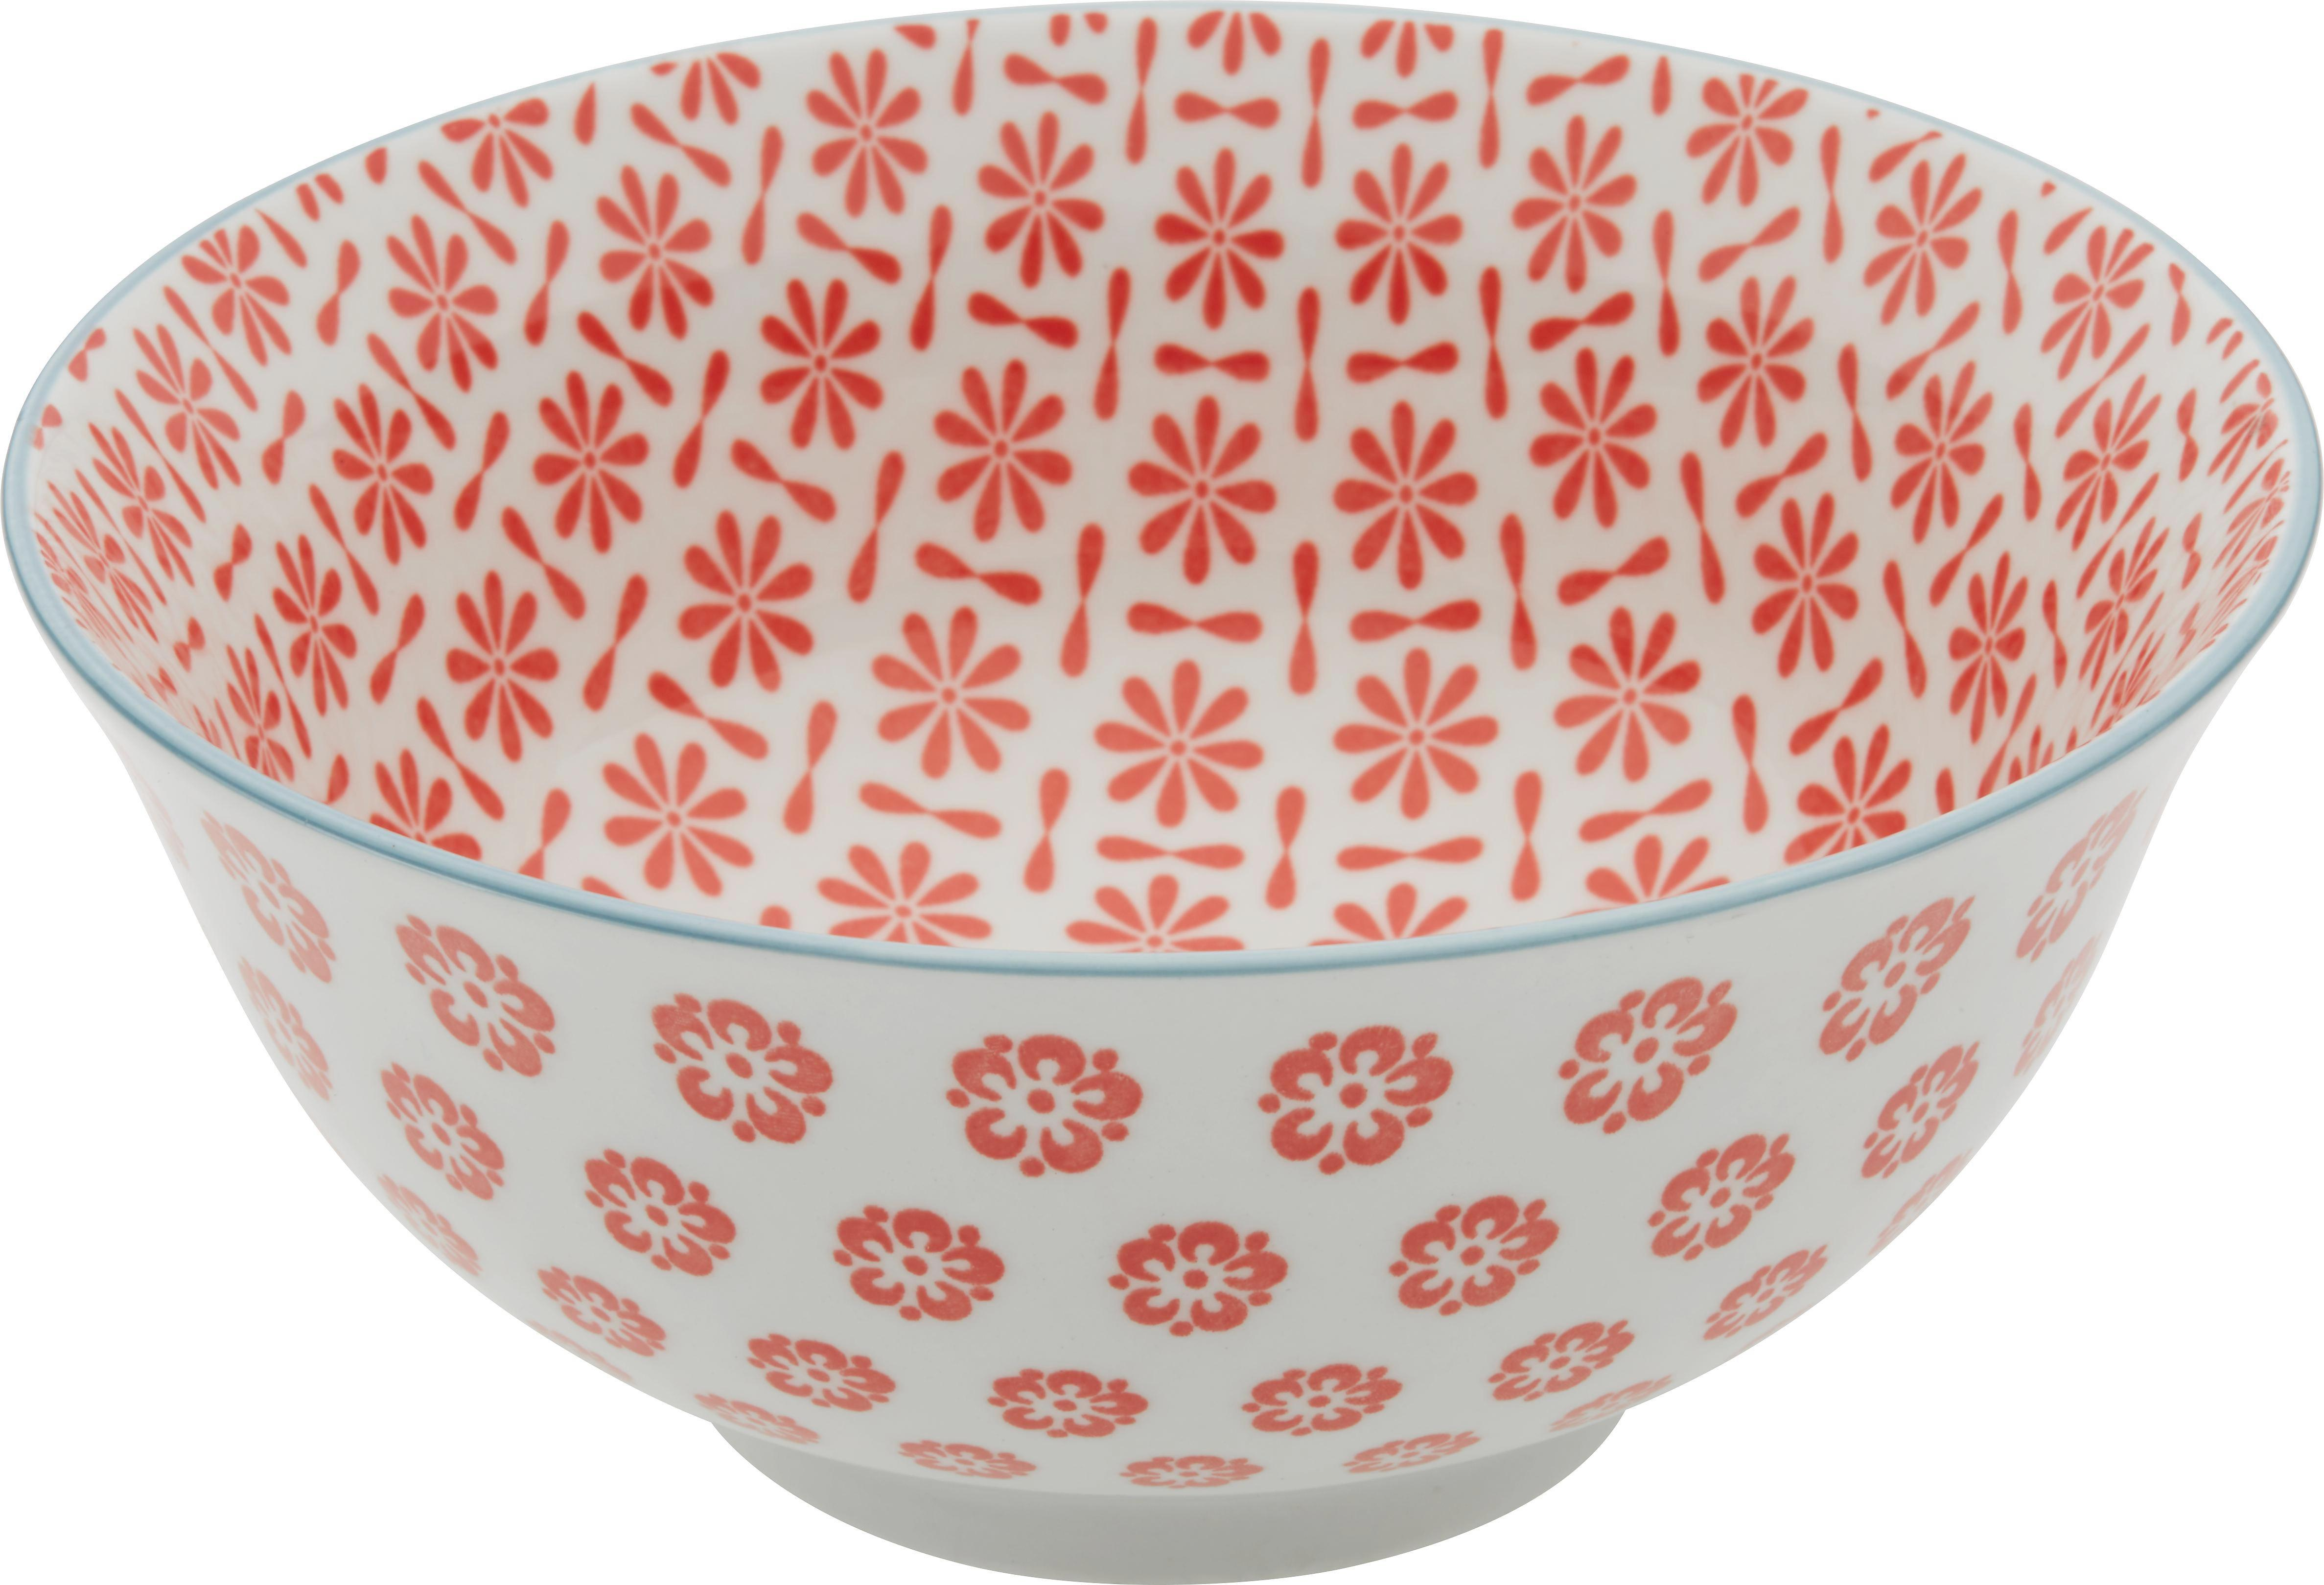 Salatschüssel Shakti aus Porzellan - Multicolor, LIFESTYLE, Keramik (15,5/7cm) - MÖMAX modern living